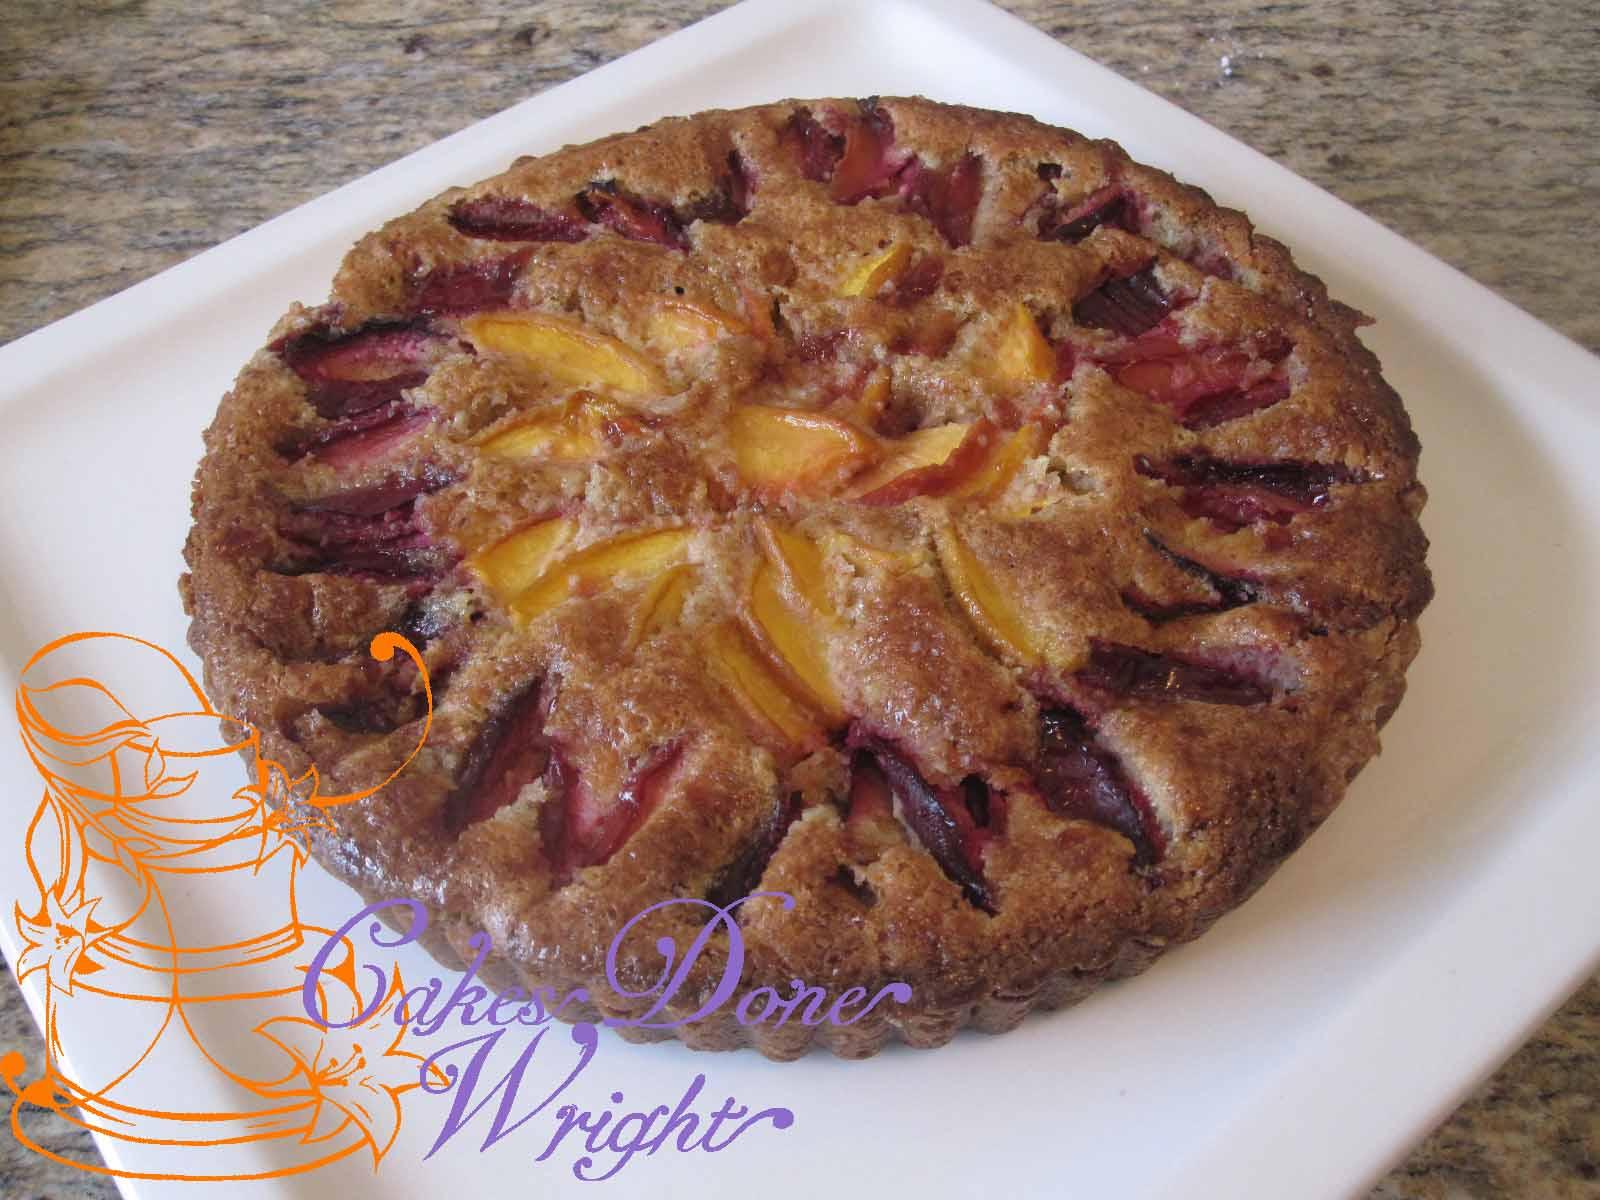 Plum Peach and almond tart